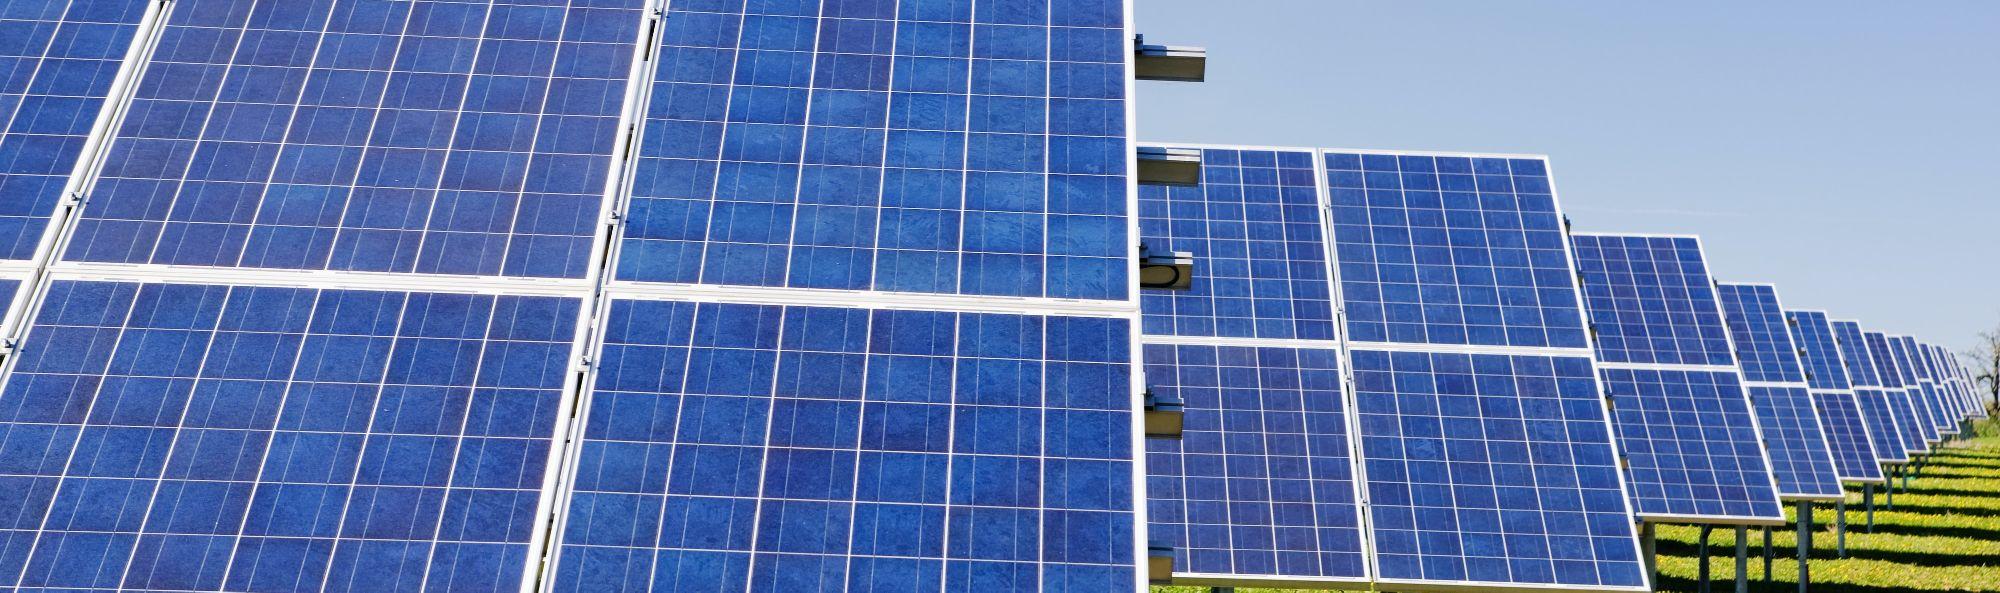 AleaSoft - Paneles solares fotovoltaicos energias renovables